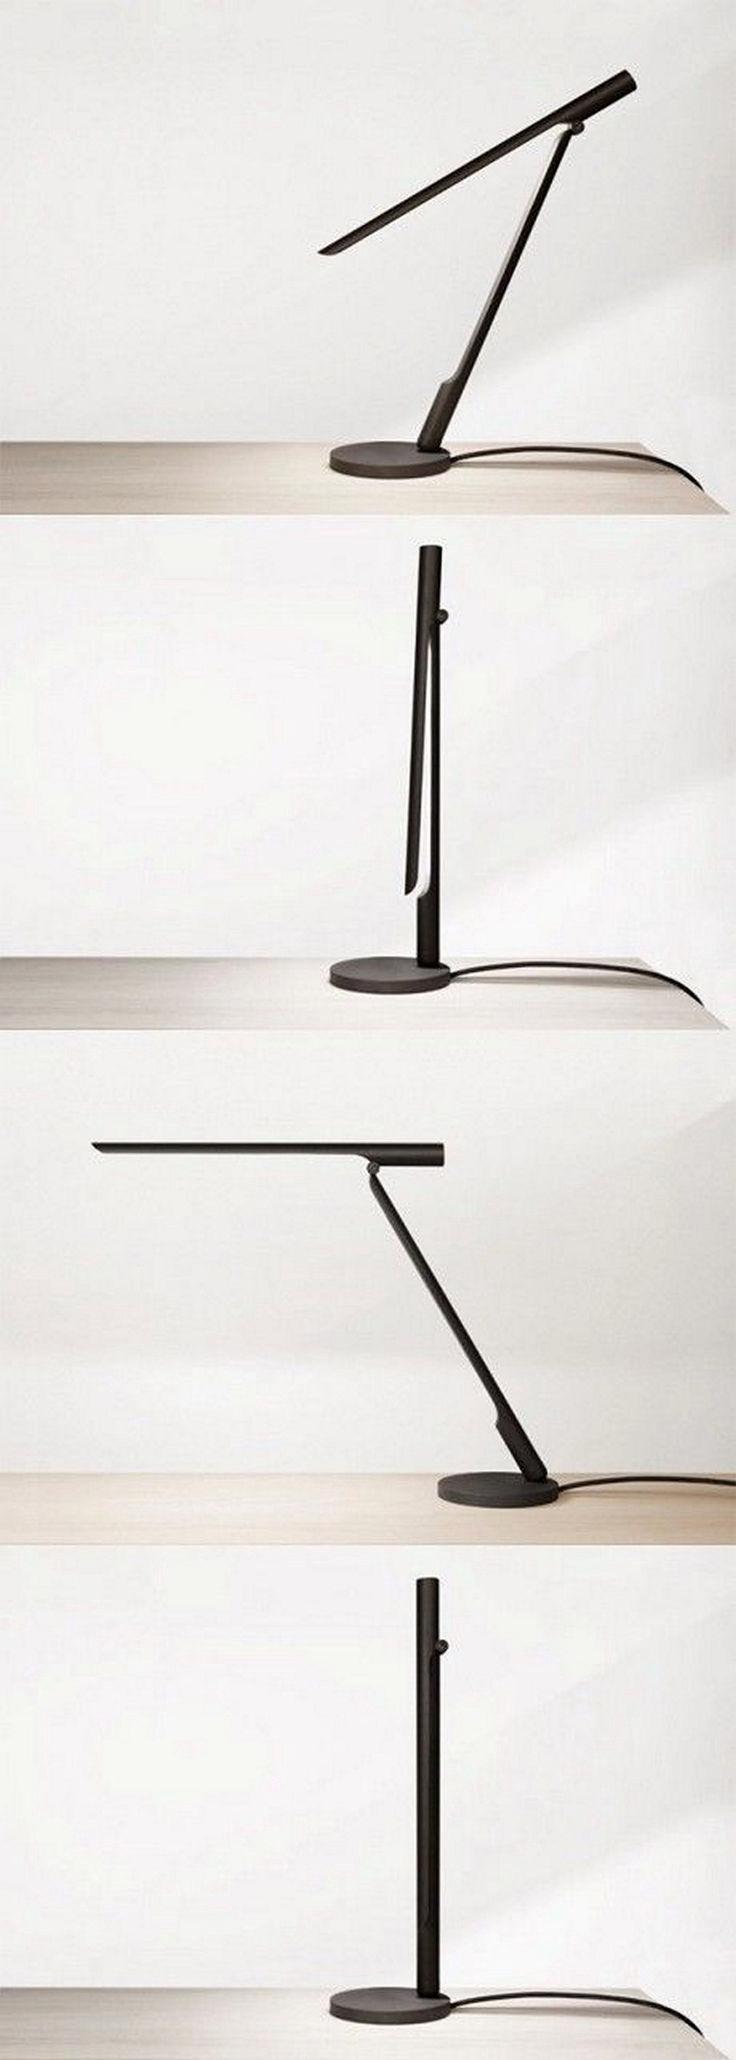 Wh wholesale vintage lead crystal table lamp buy cheap - 141 Gorgeous Desk Lamp Designs